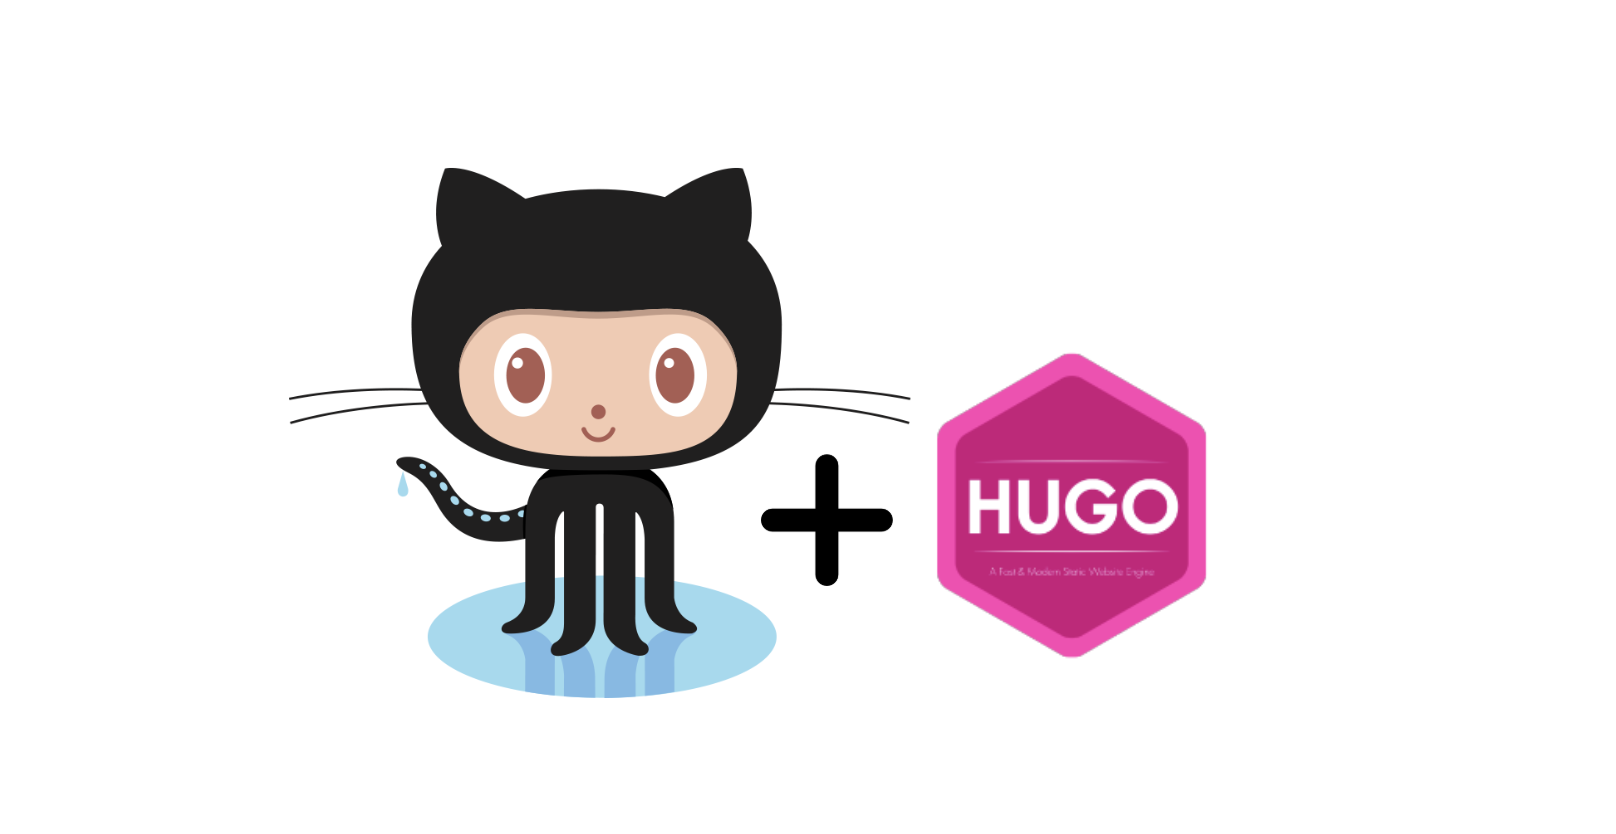 1-GitHub plus Hugo logos